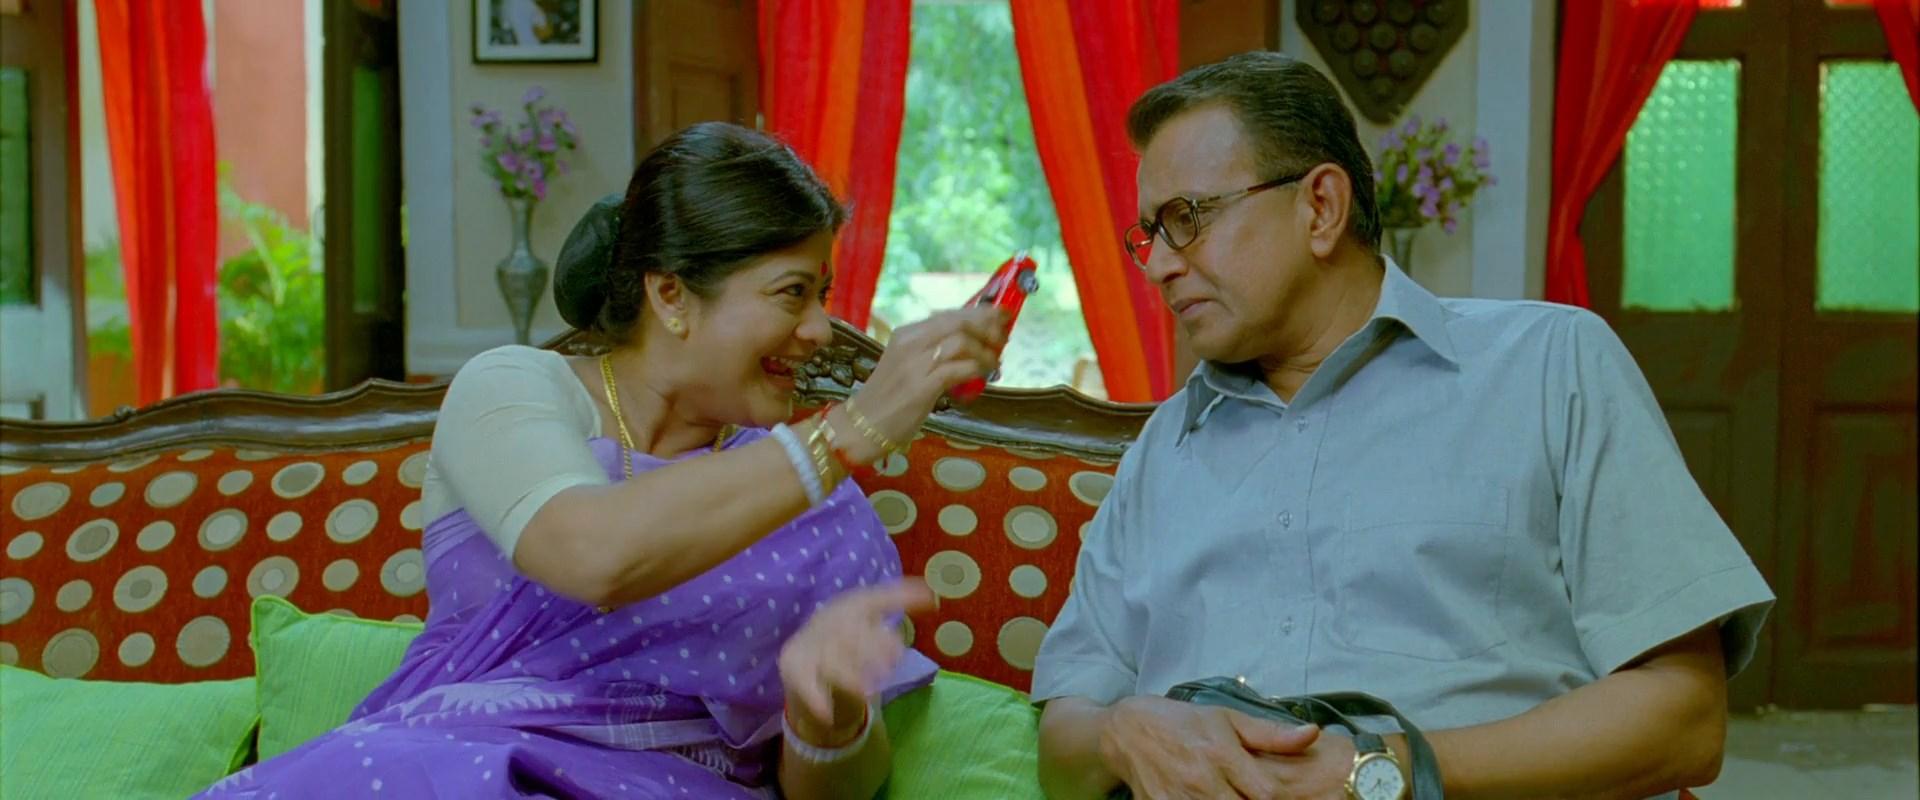 Ami Shubhash Bolchi.2020.Bangali.1080p.WEB DL.H264.AAC.D0T.Telly.mkv snapshot 00.29.36.000